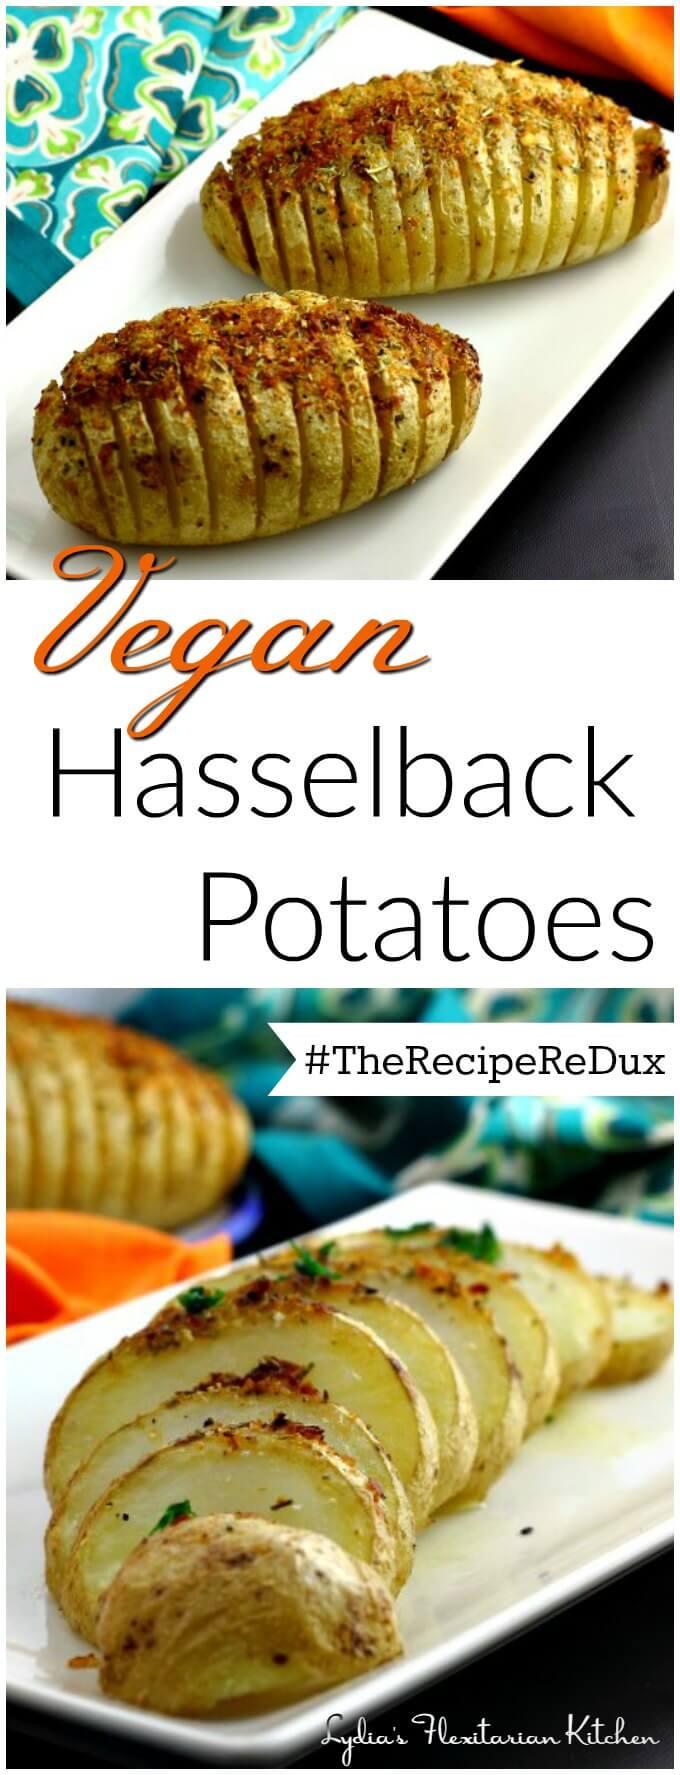 Vegan Hasselback Potatoes ~ Lydia's Flexitarian Kitchen